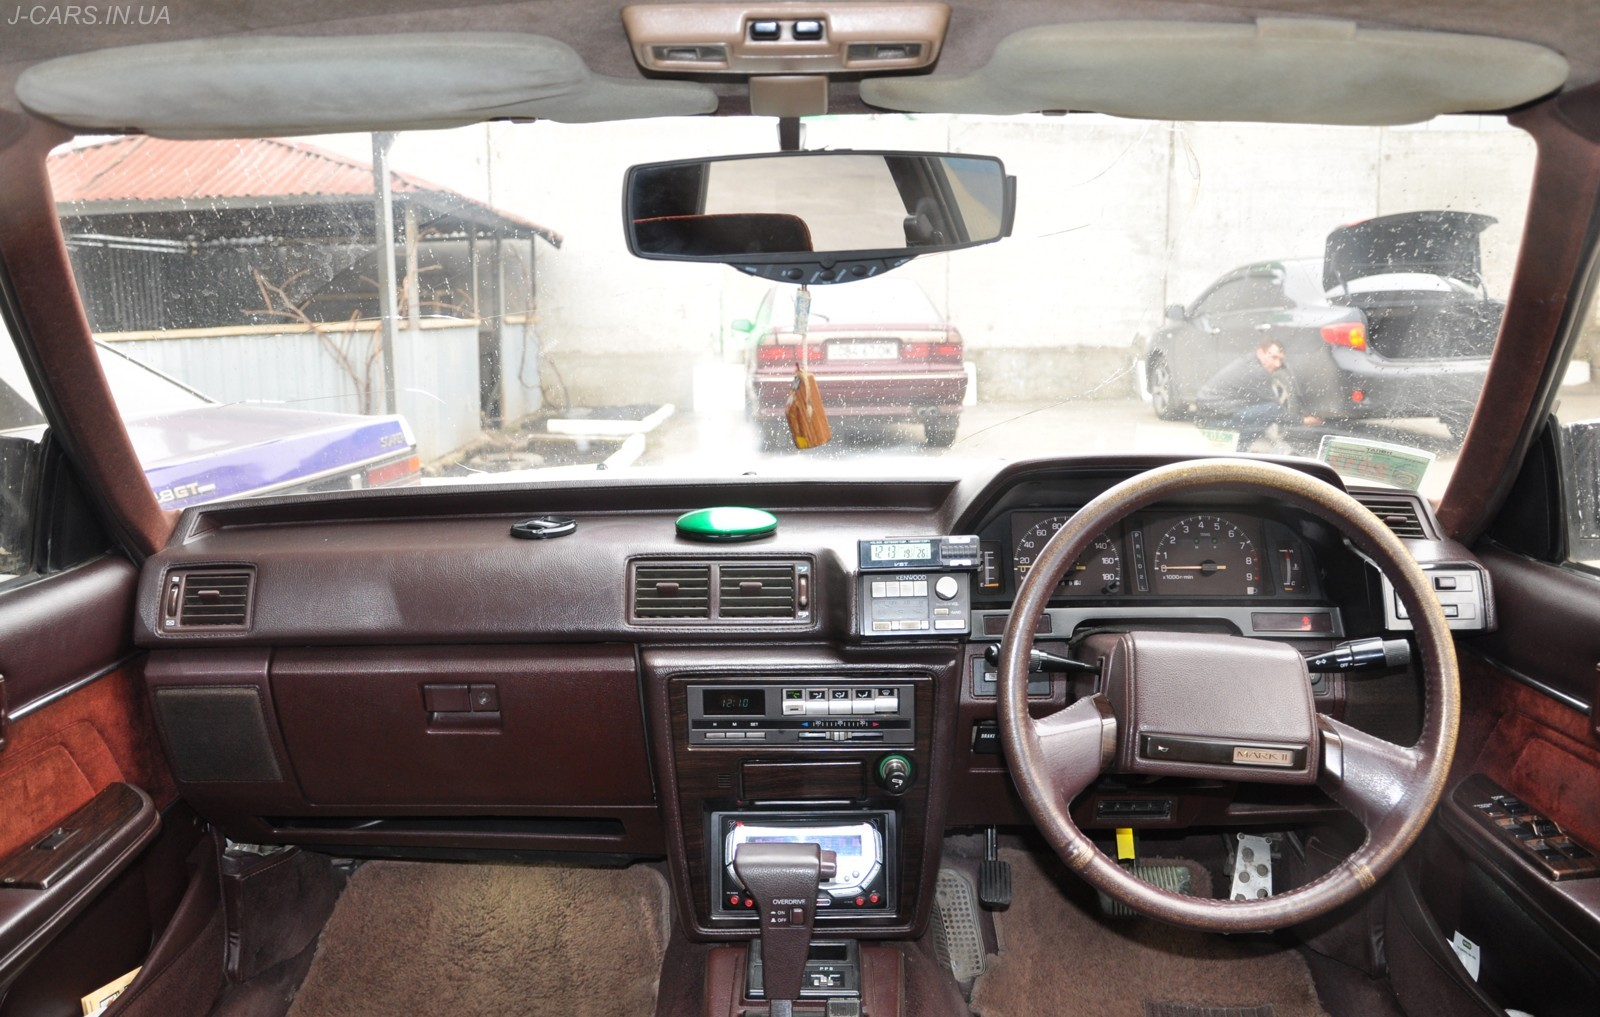 MarkII GX71 1G-GE j-cars.in.ua Одесса Украина